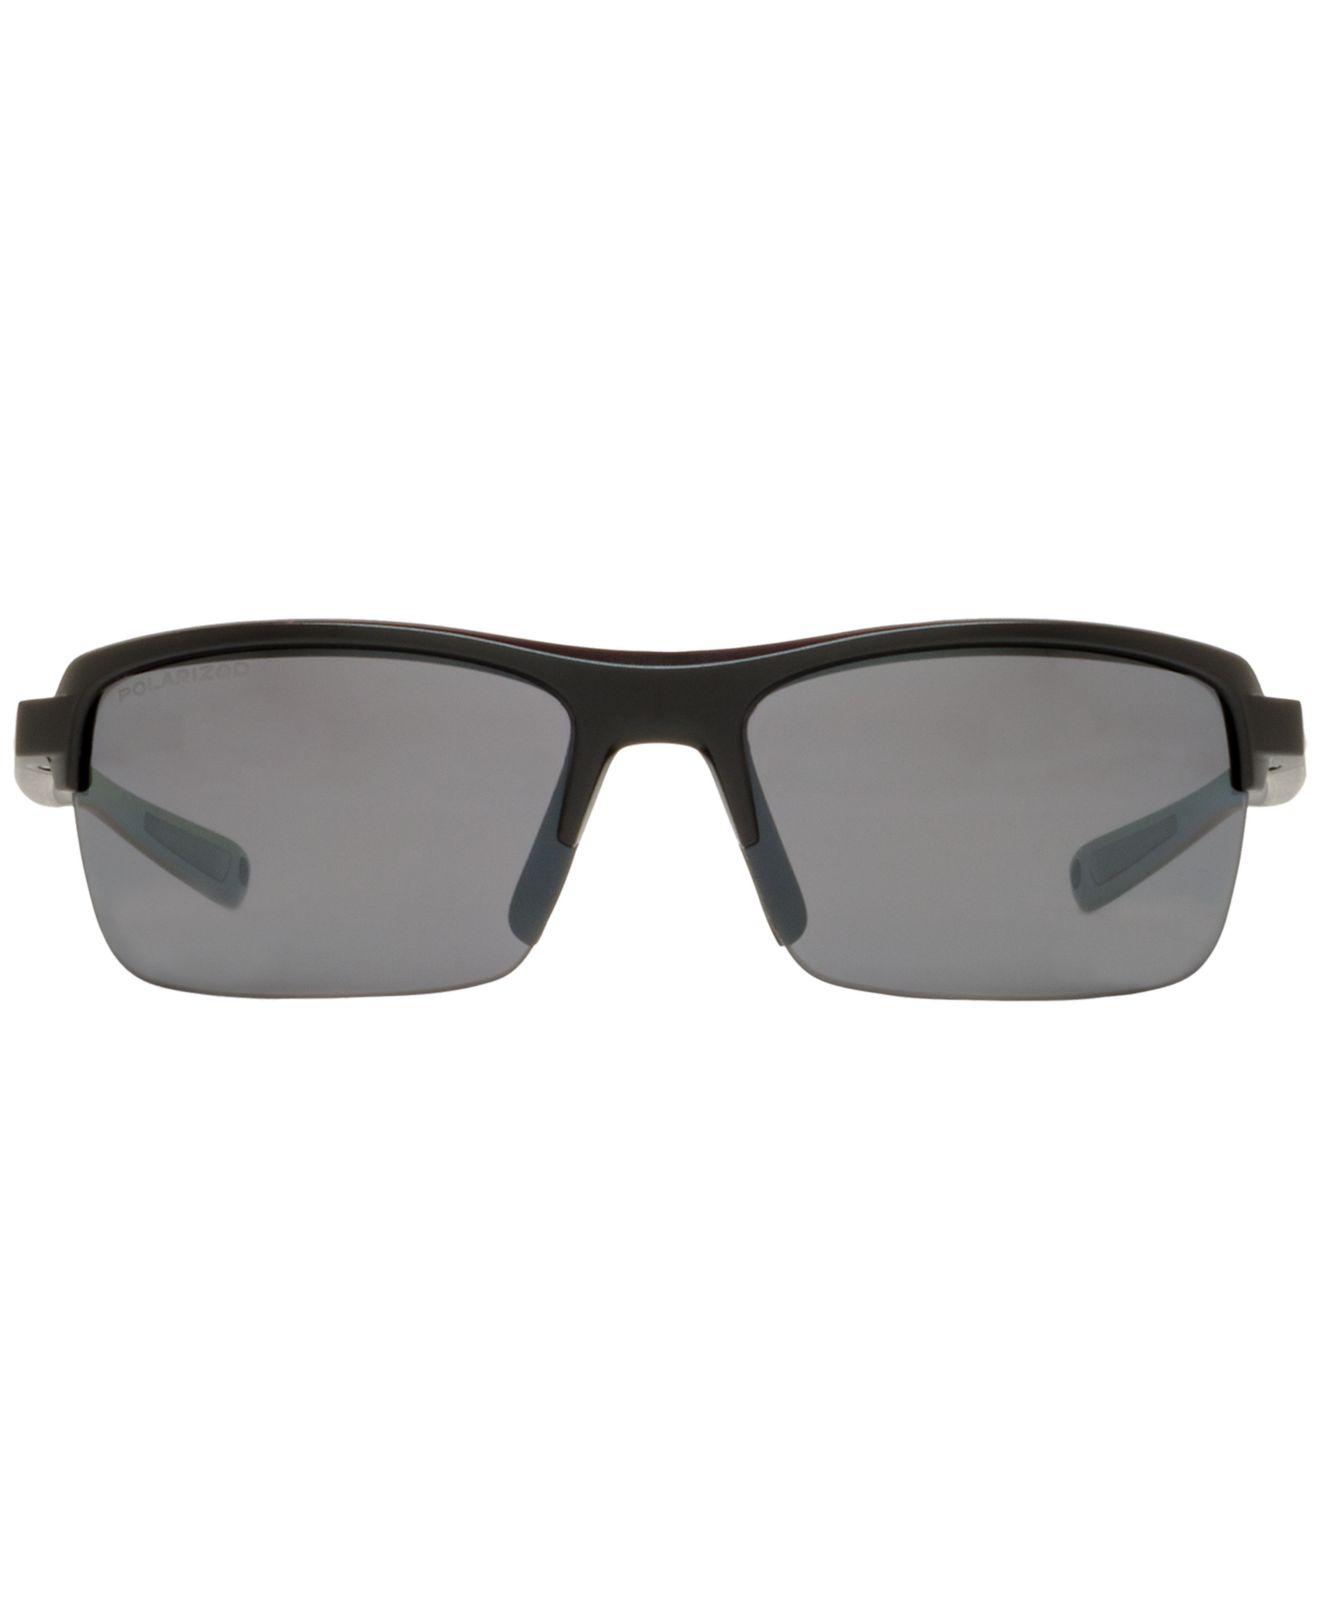 2436312b218 Lyst - Revo Re4066 Crux Np in Black for Men